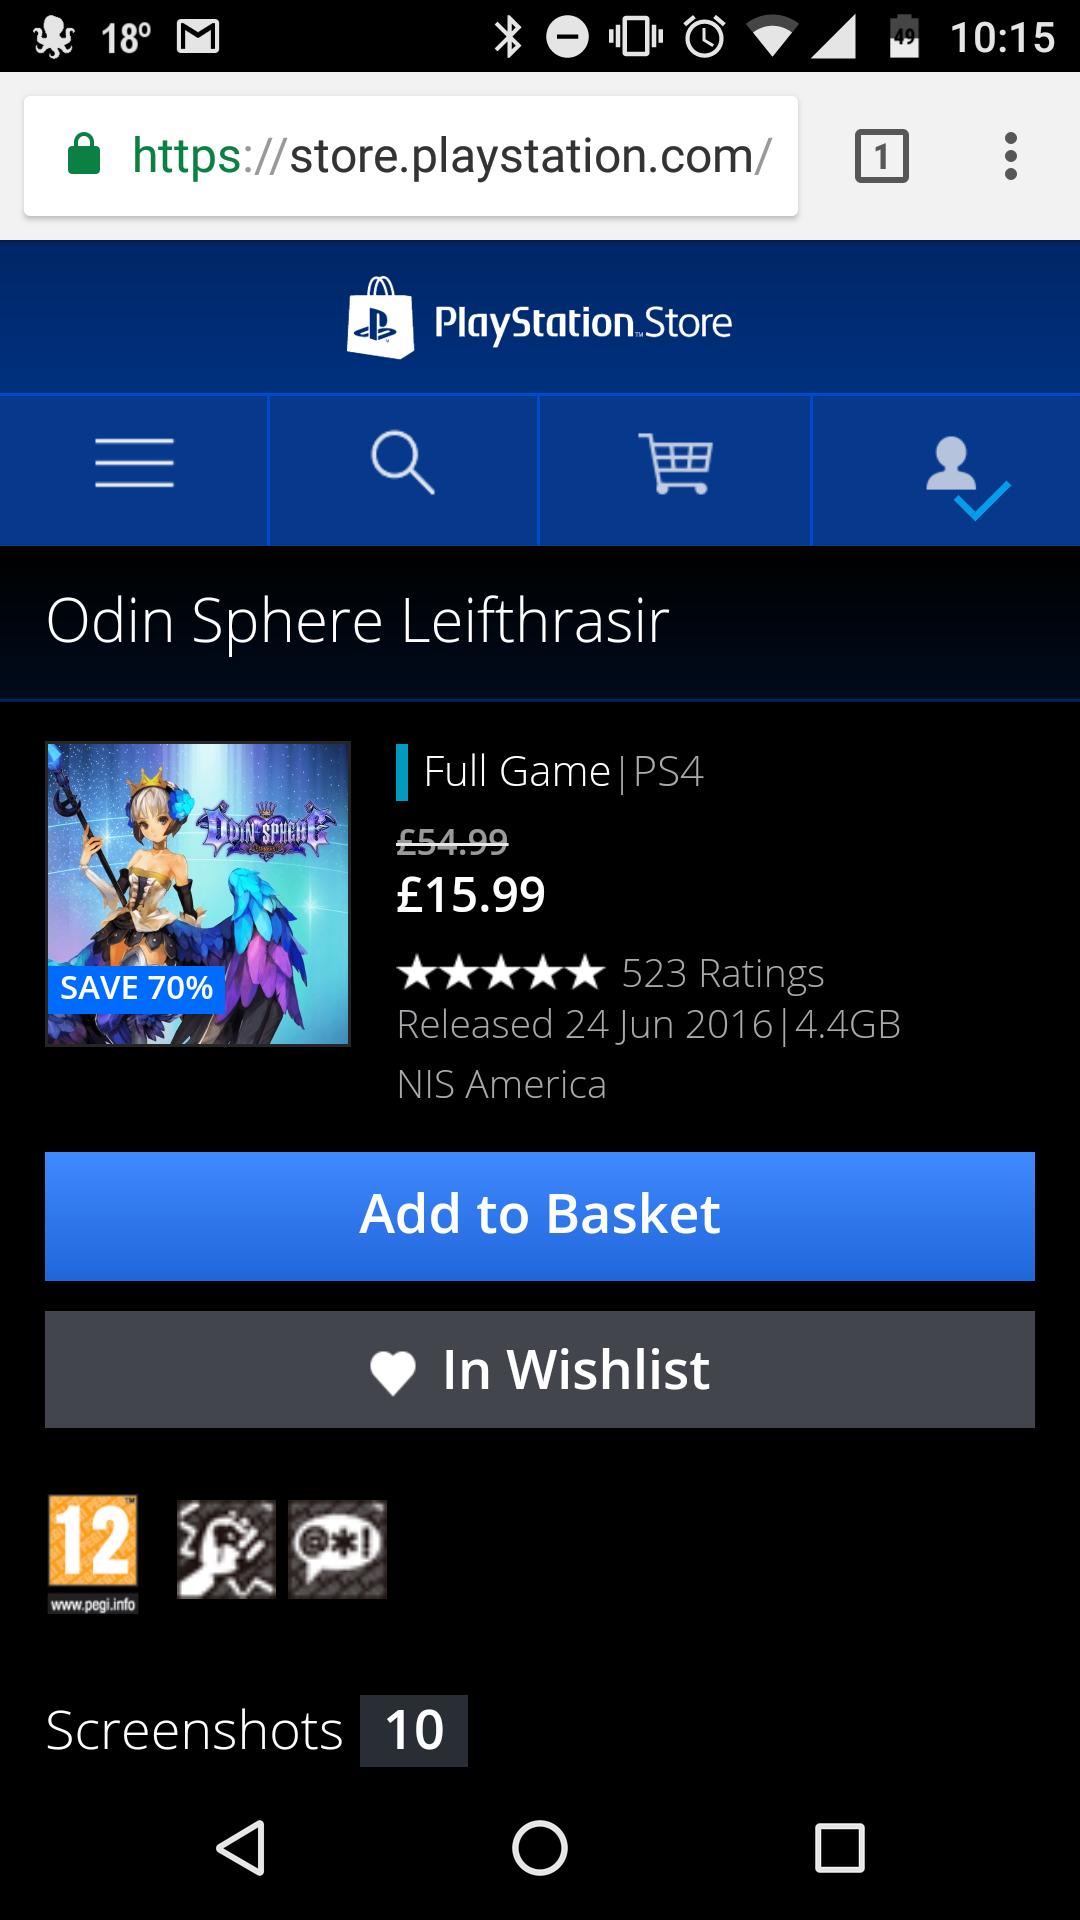 Hidden PSN Store Sale: Odin Sphere Leifthrasir £15.99, Yakuza 0 £24.99, One Piece: Pirate Warriors 3 £9.99